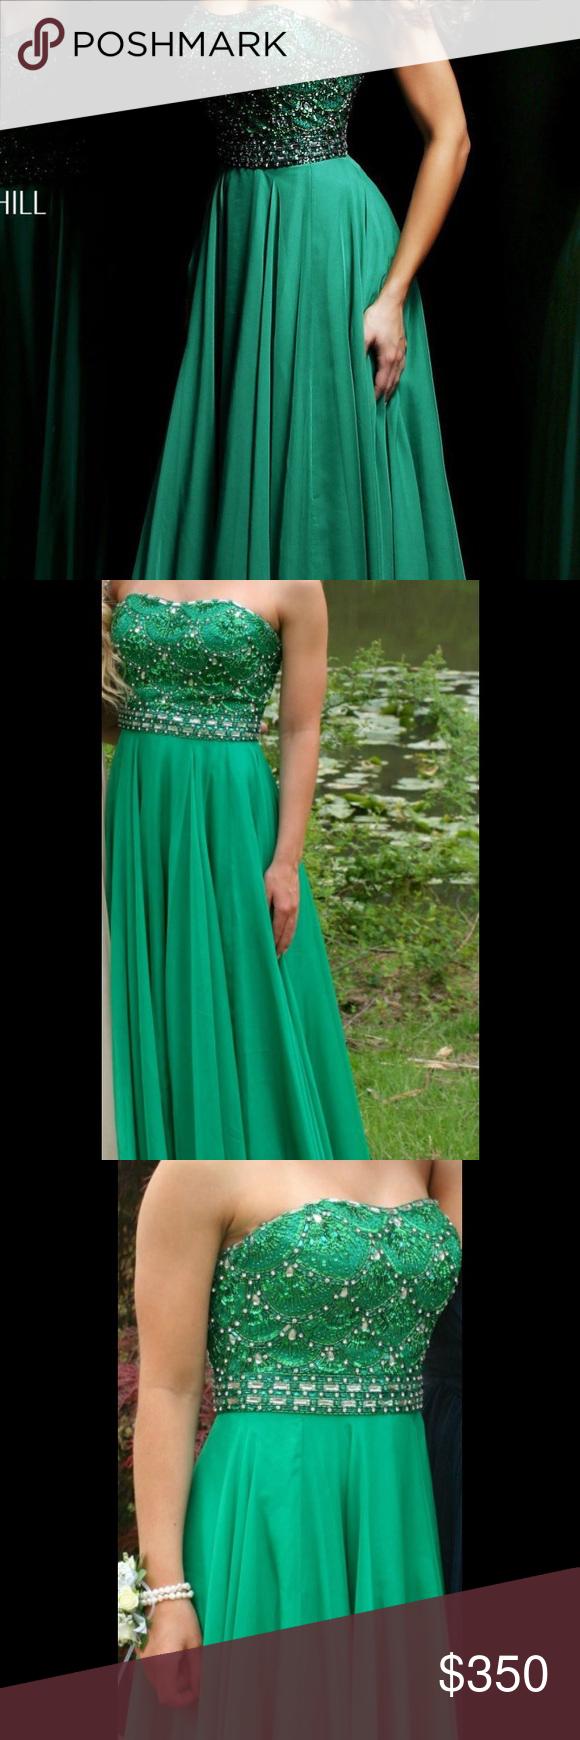 Sherri hill prom dress sadie robertson line my posh picks